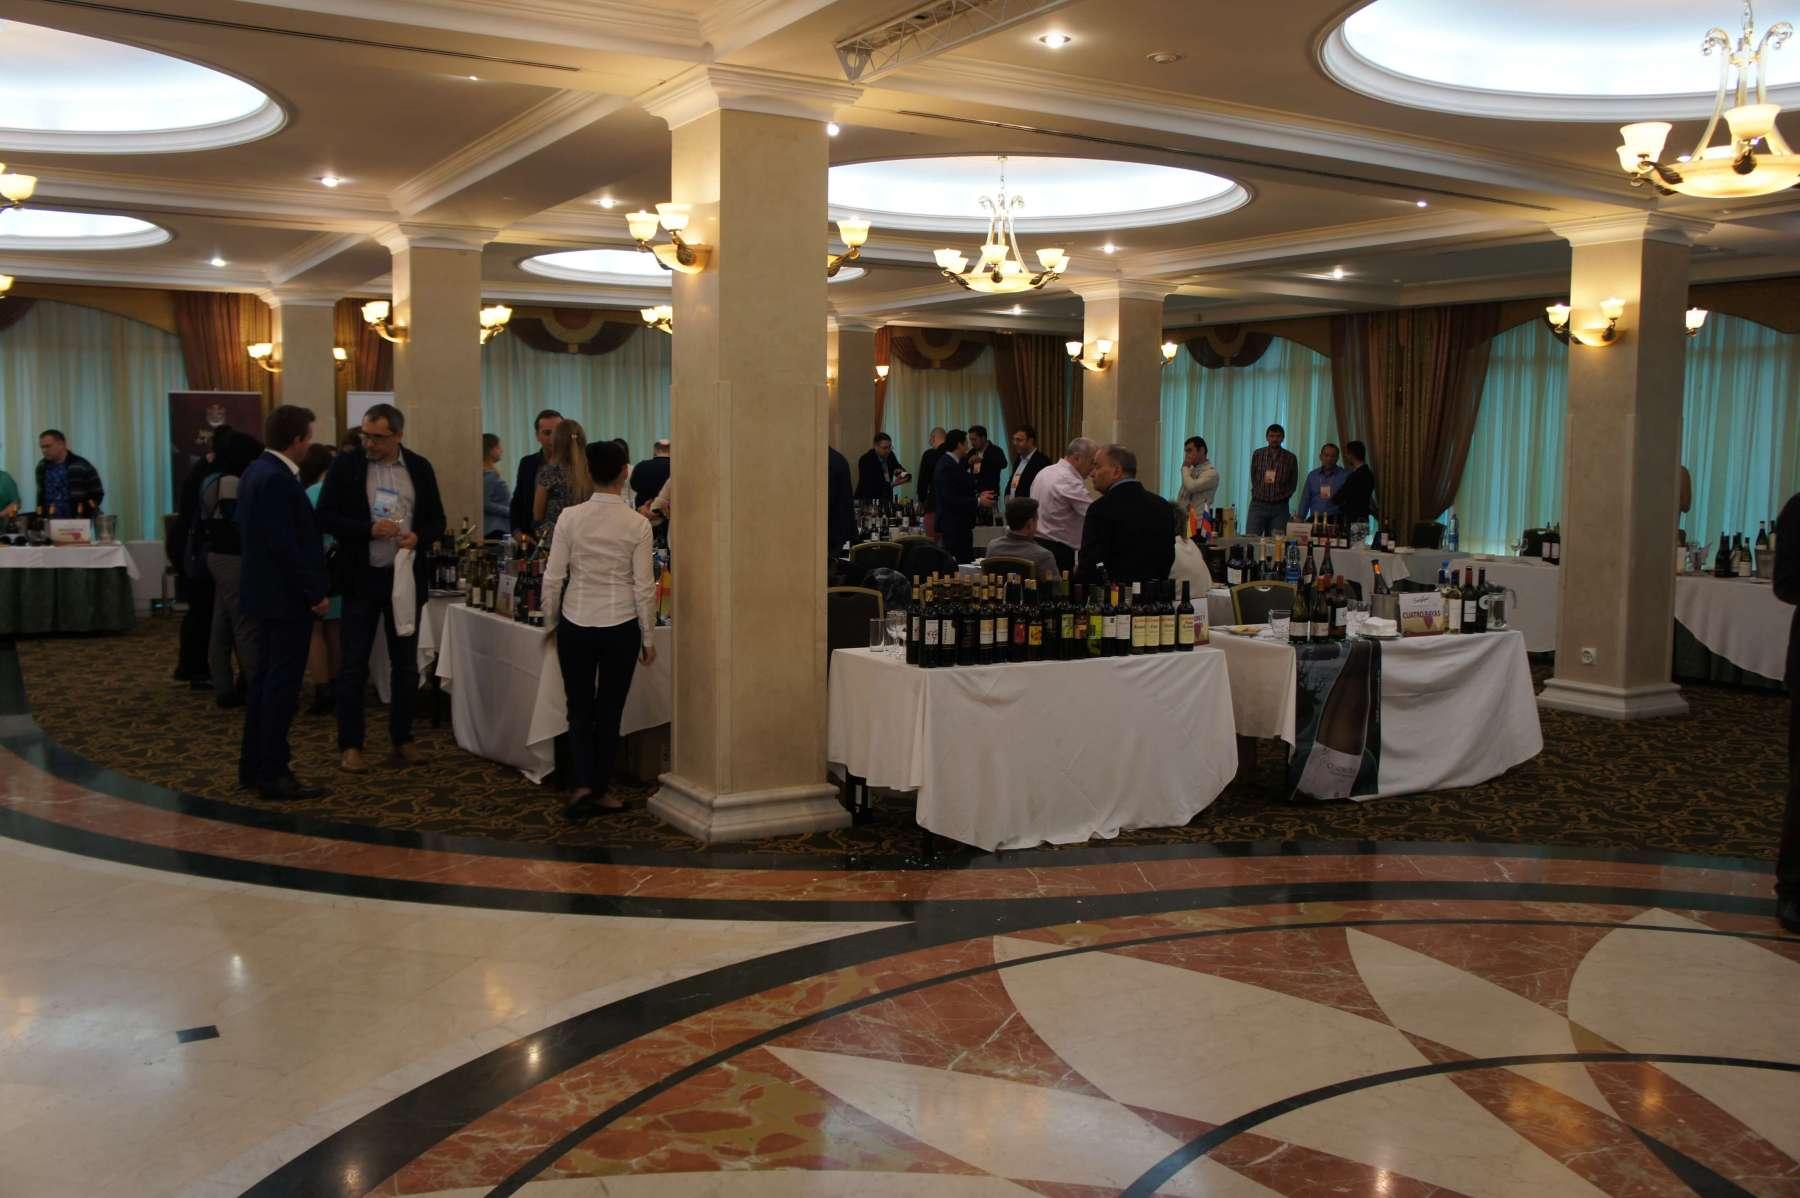 xii_spanish_wines_salon_october_2016_rostov-on-don_1_20170120_1725455712